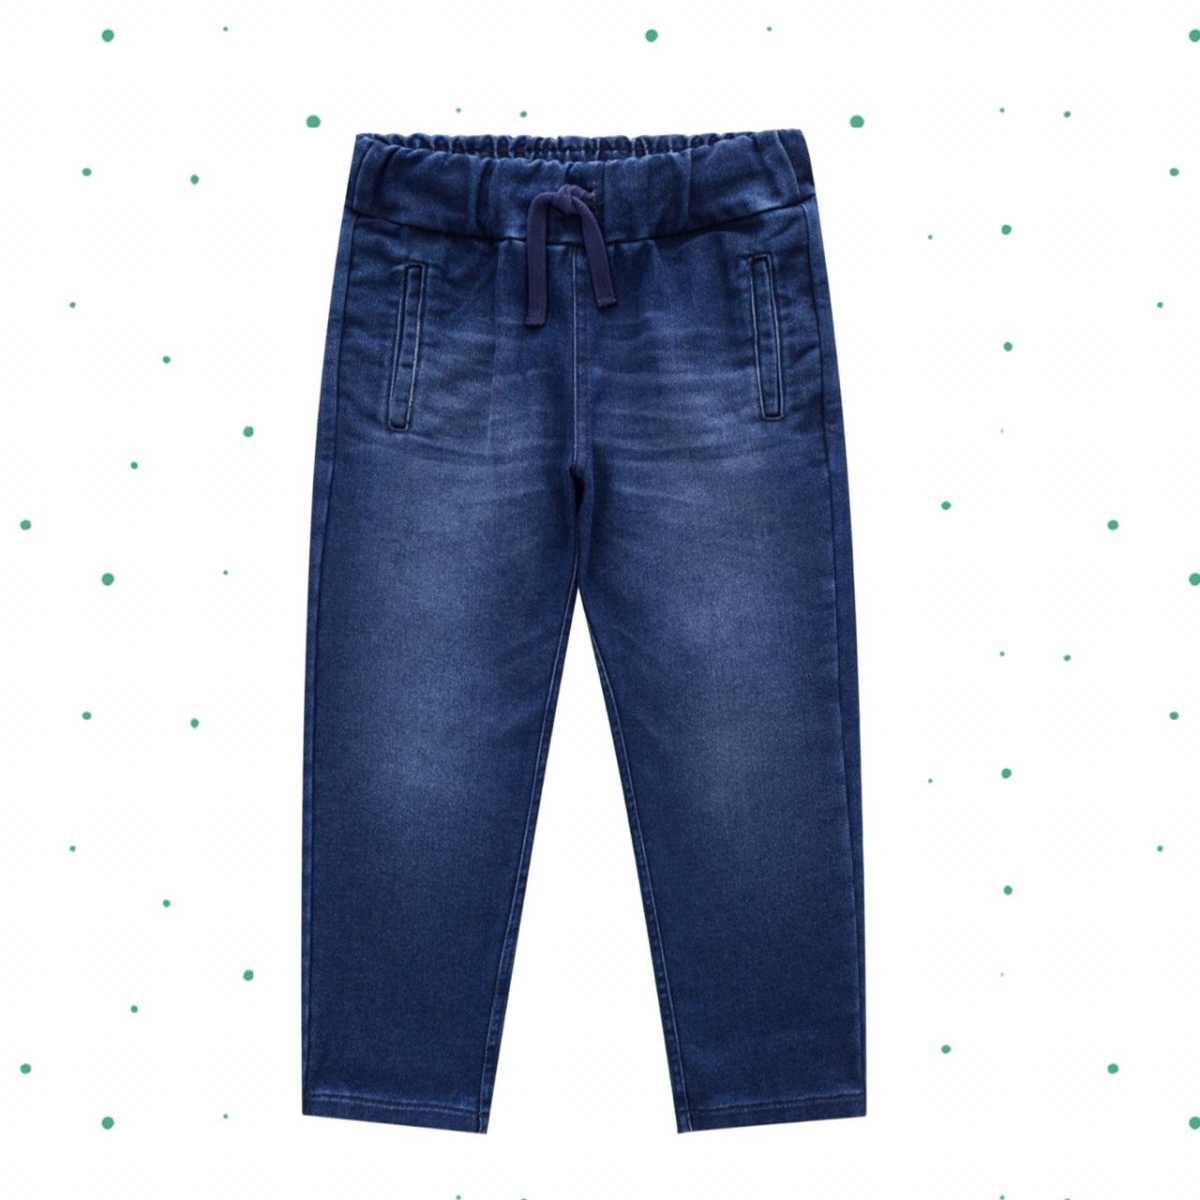 Calça Menino Milon em Malha Jeans